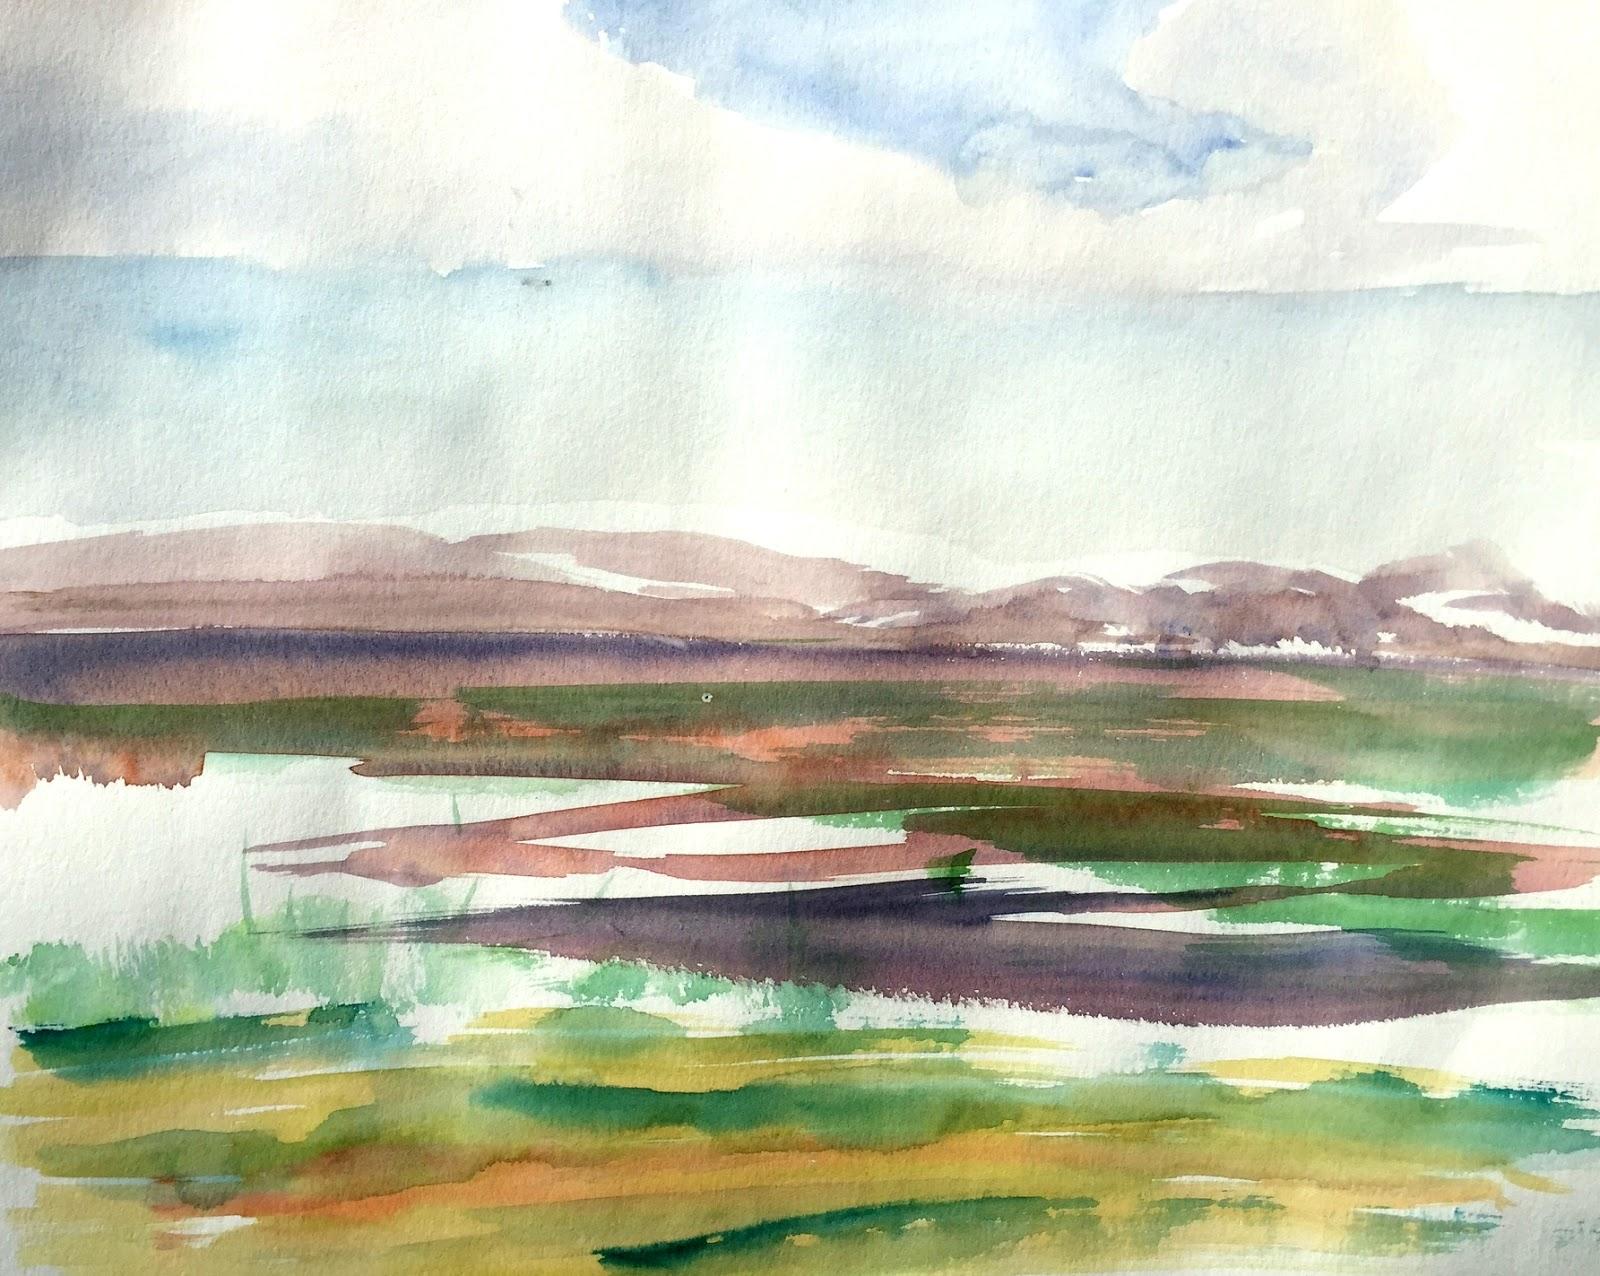 Lapland Watercolor Landscape by Artmagenta